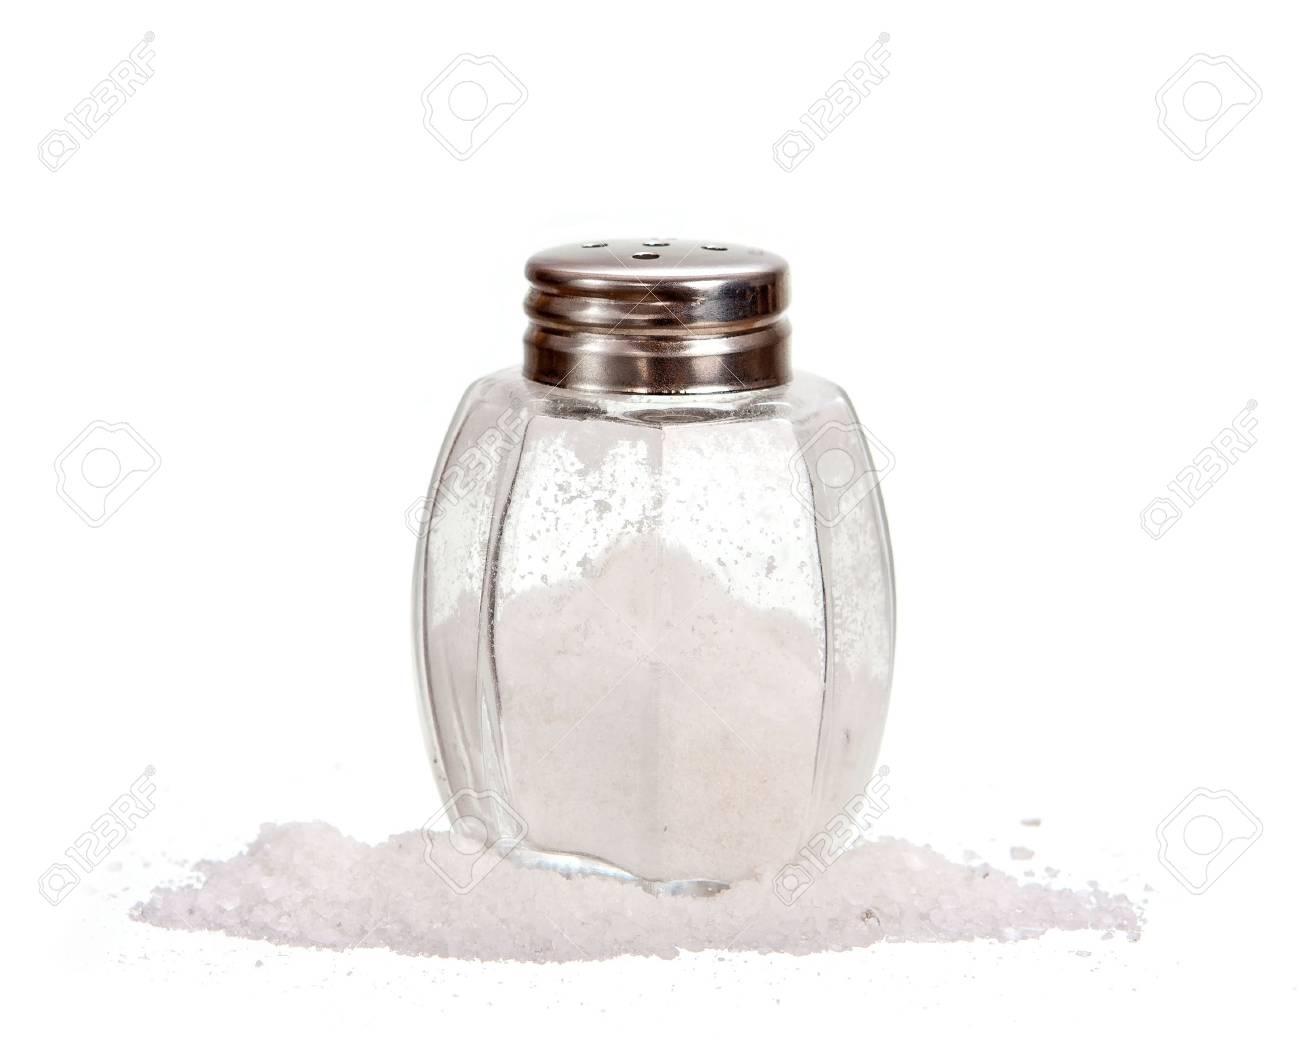 Salt shaker isolated on white Stock Photo - 13658420